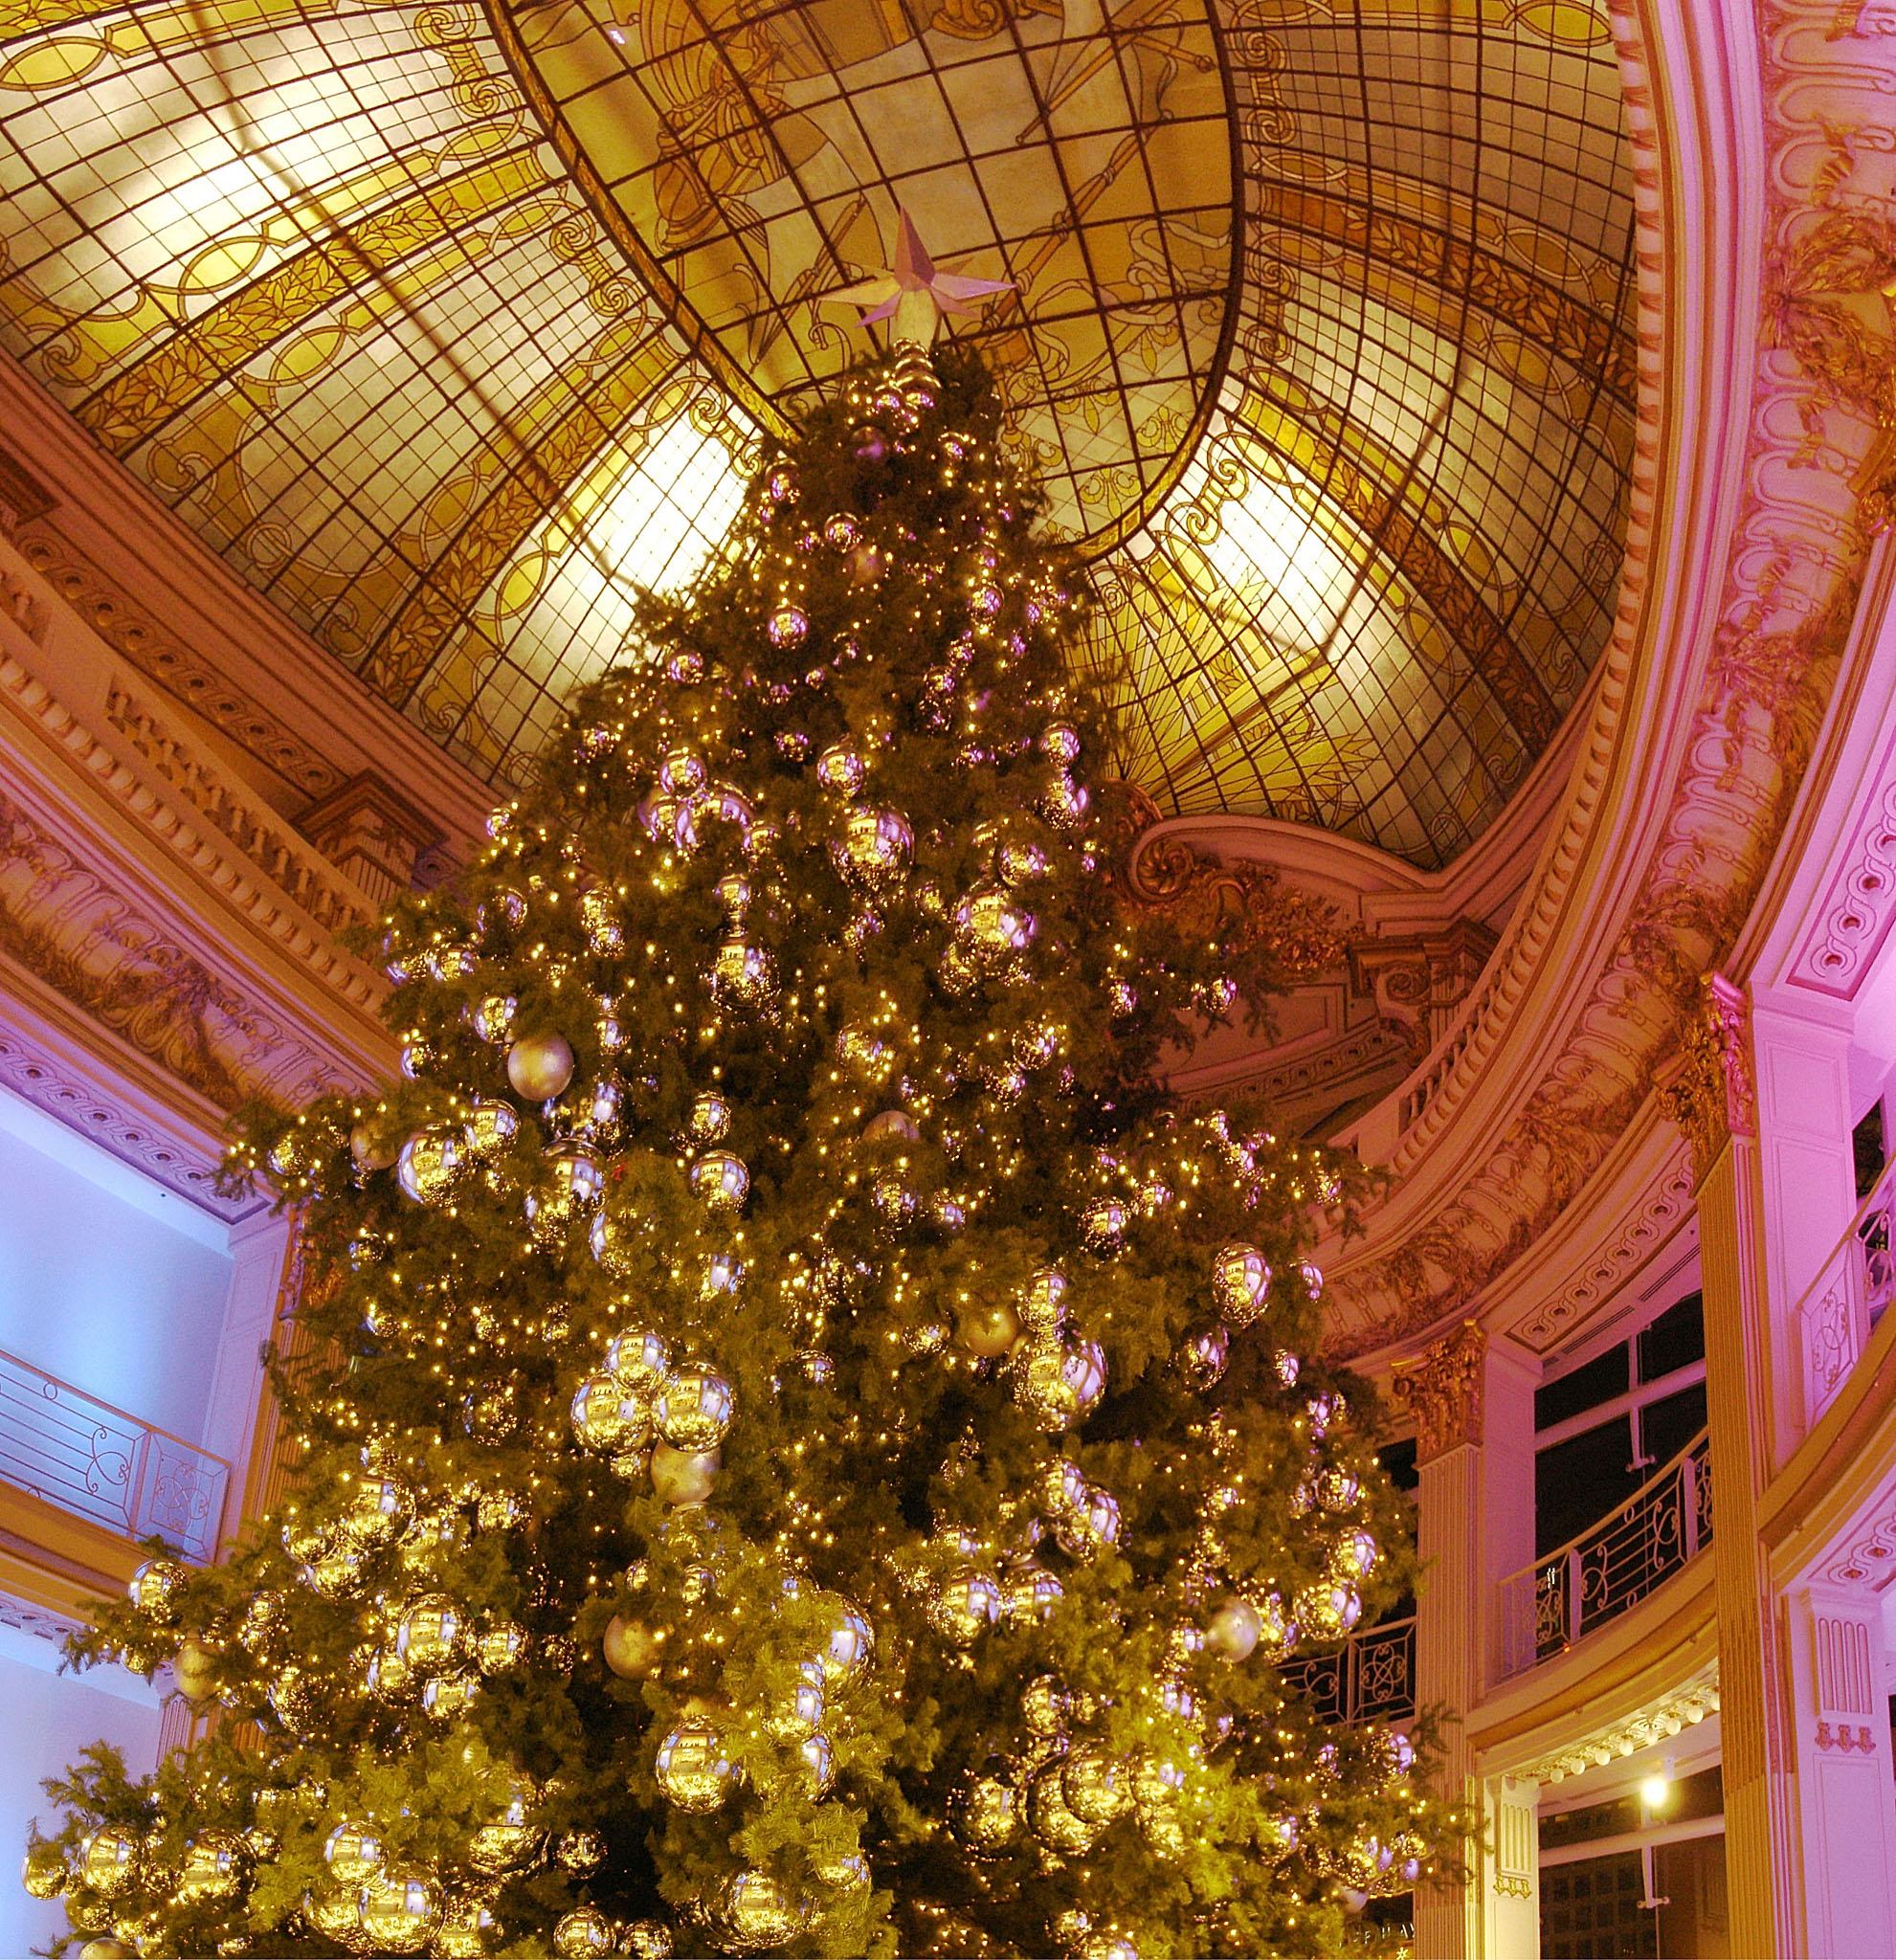 Neimanmarcus Christmas.File Inside Neiman Marcus Jpg Wikimedia Commons